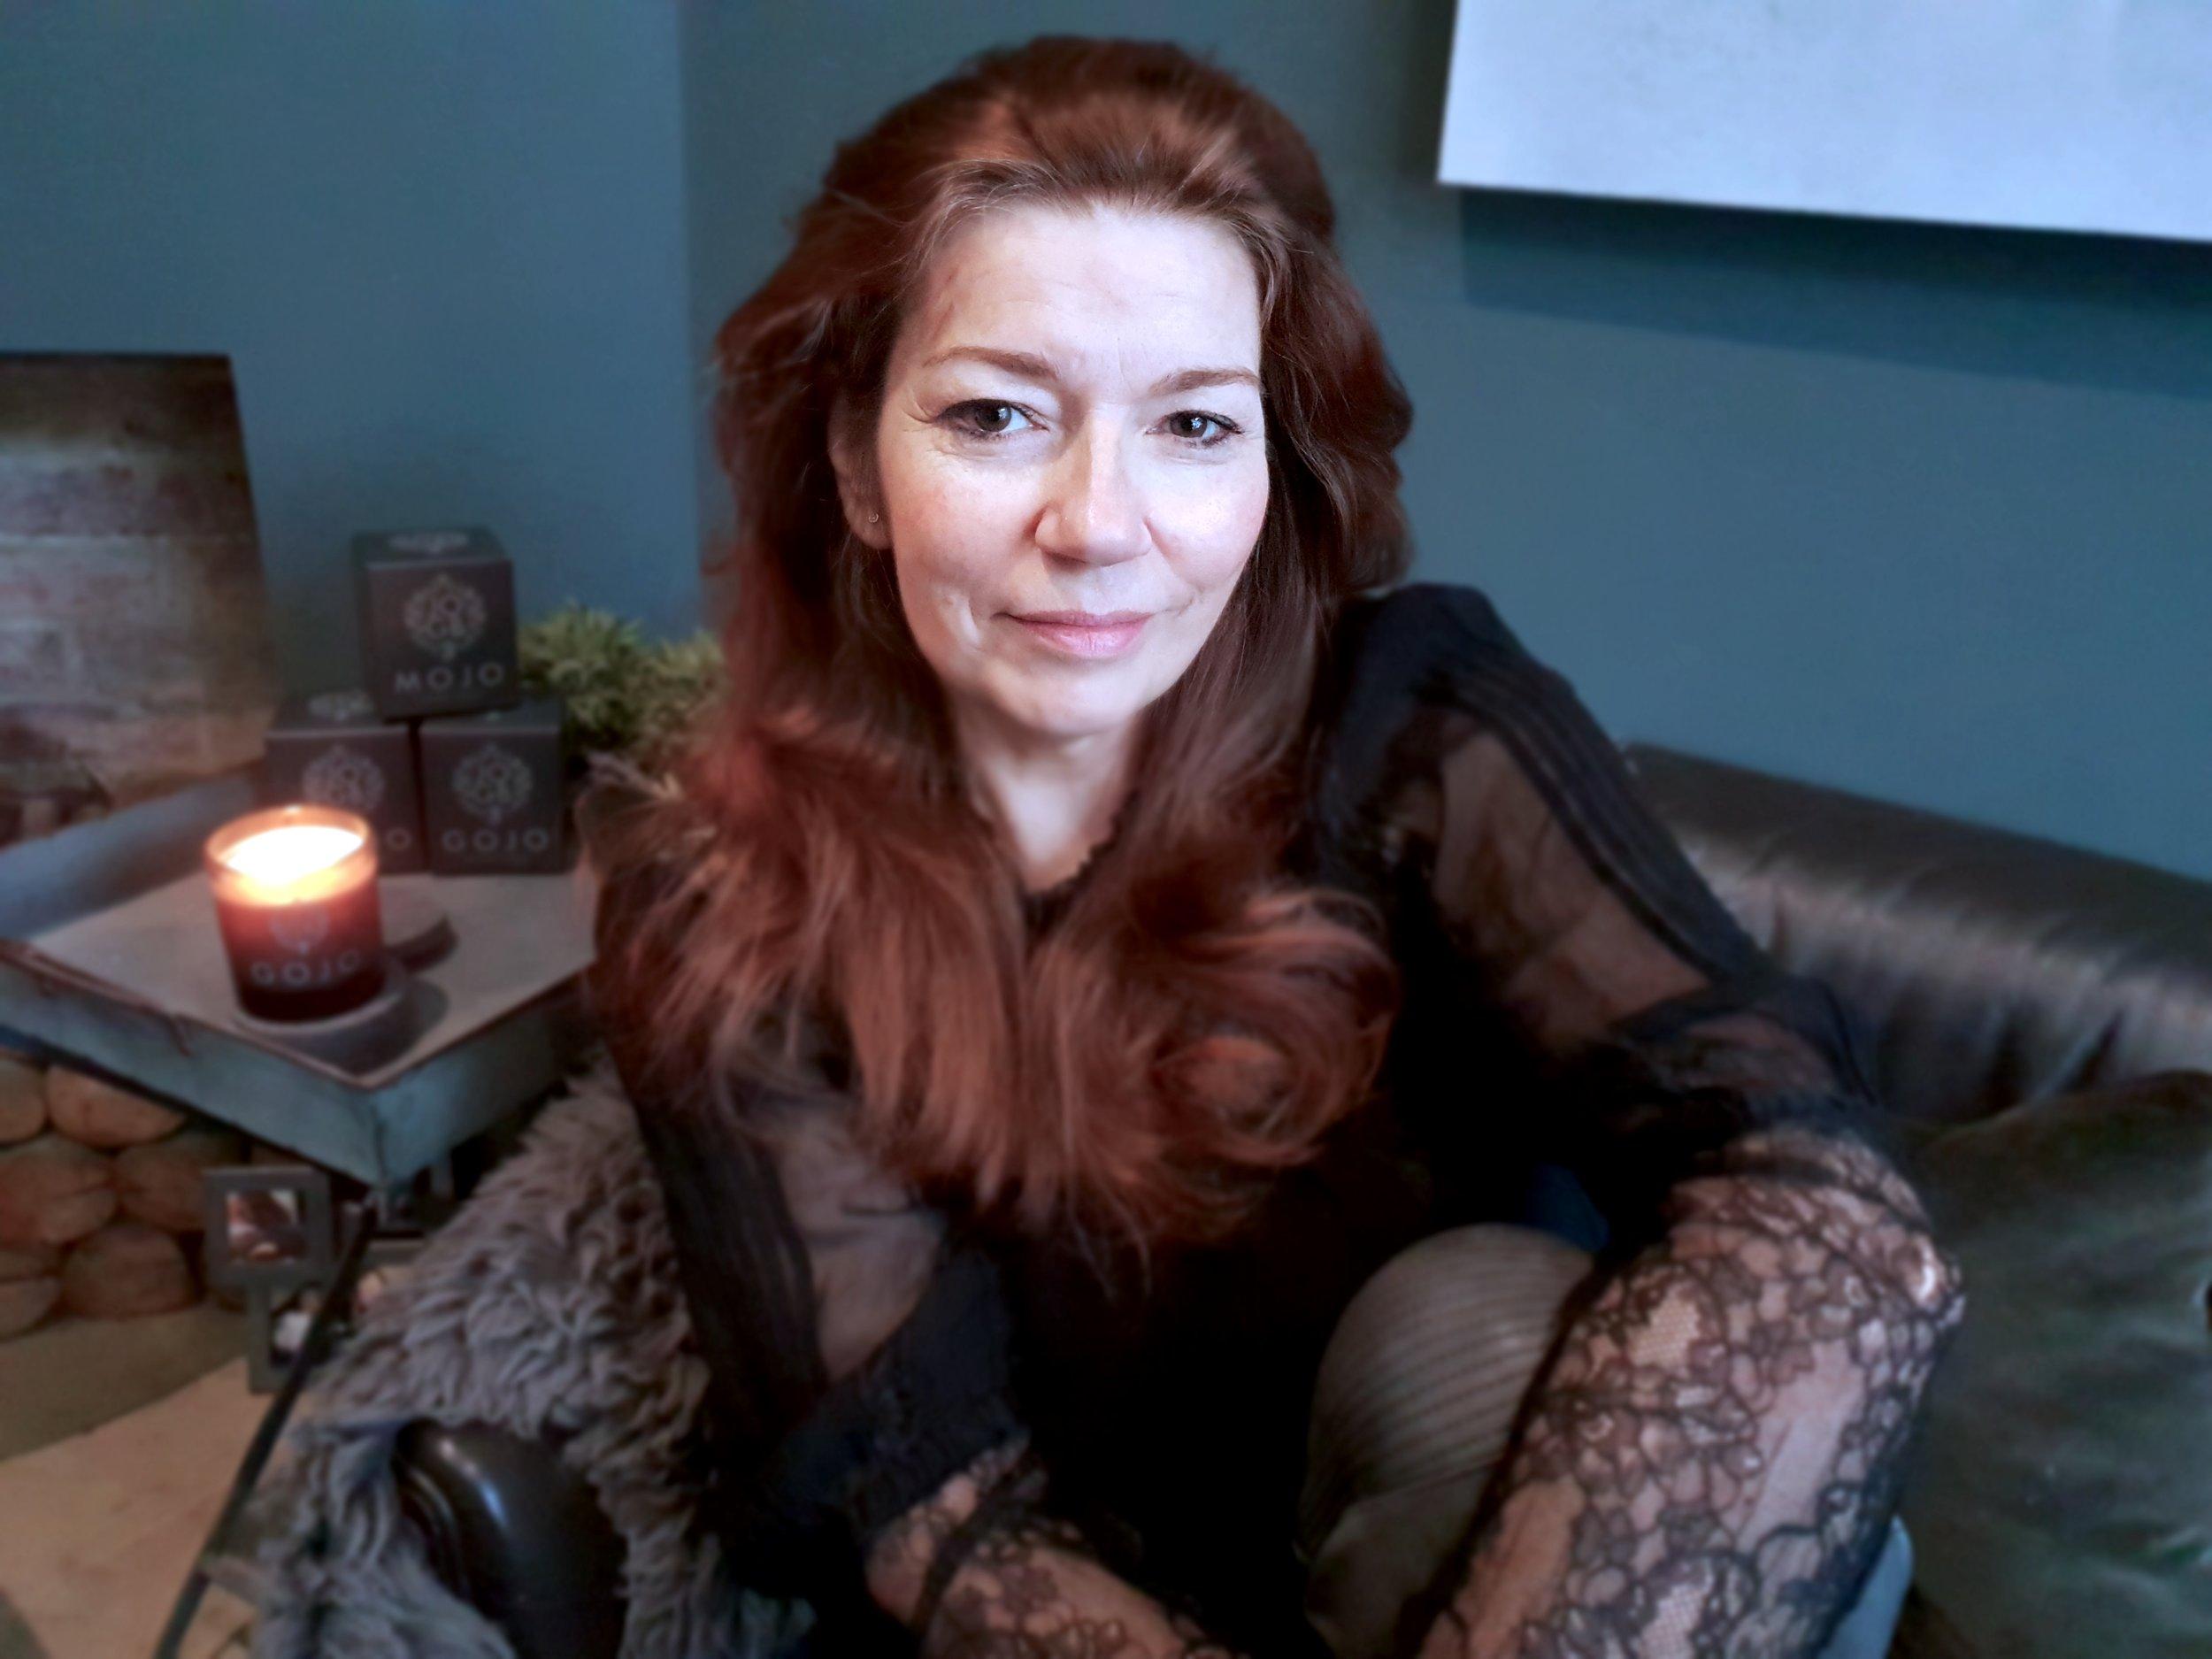 JOGB Founder, Jo Glanville-Blackburn